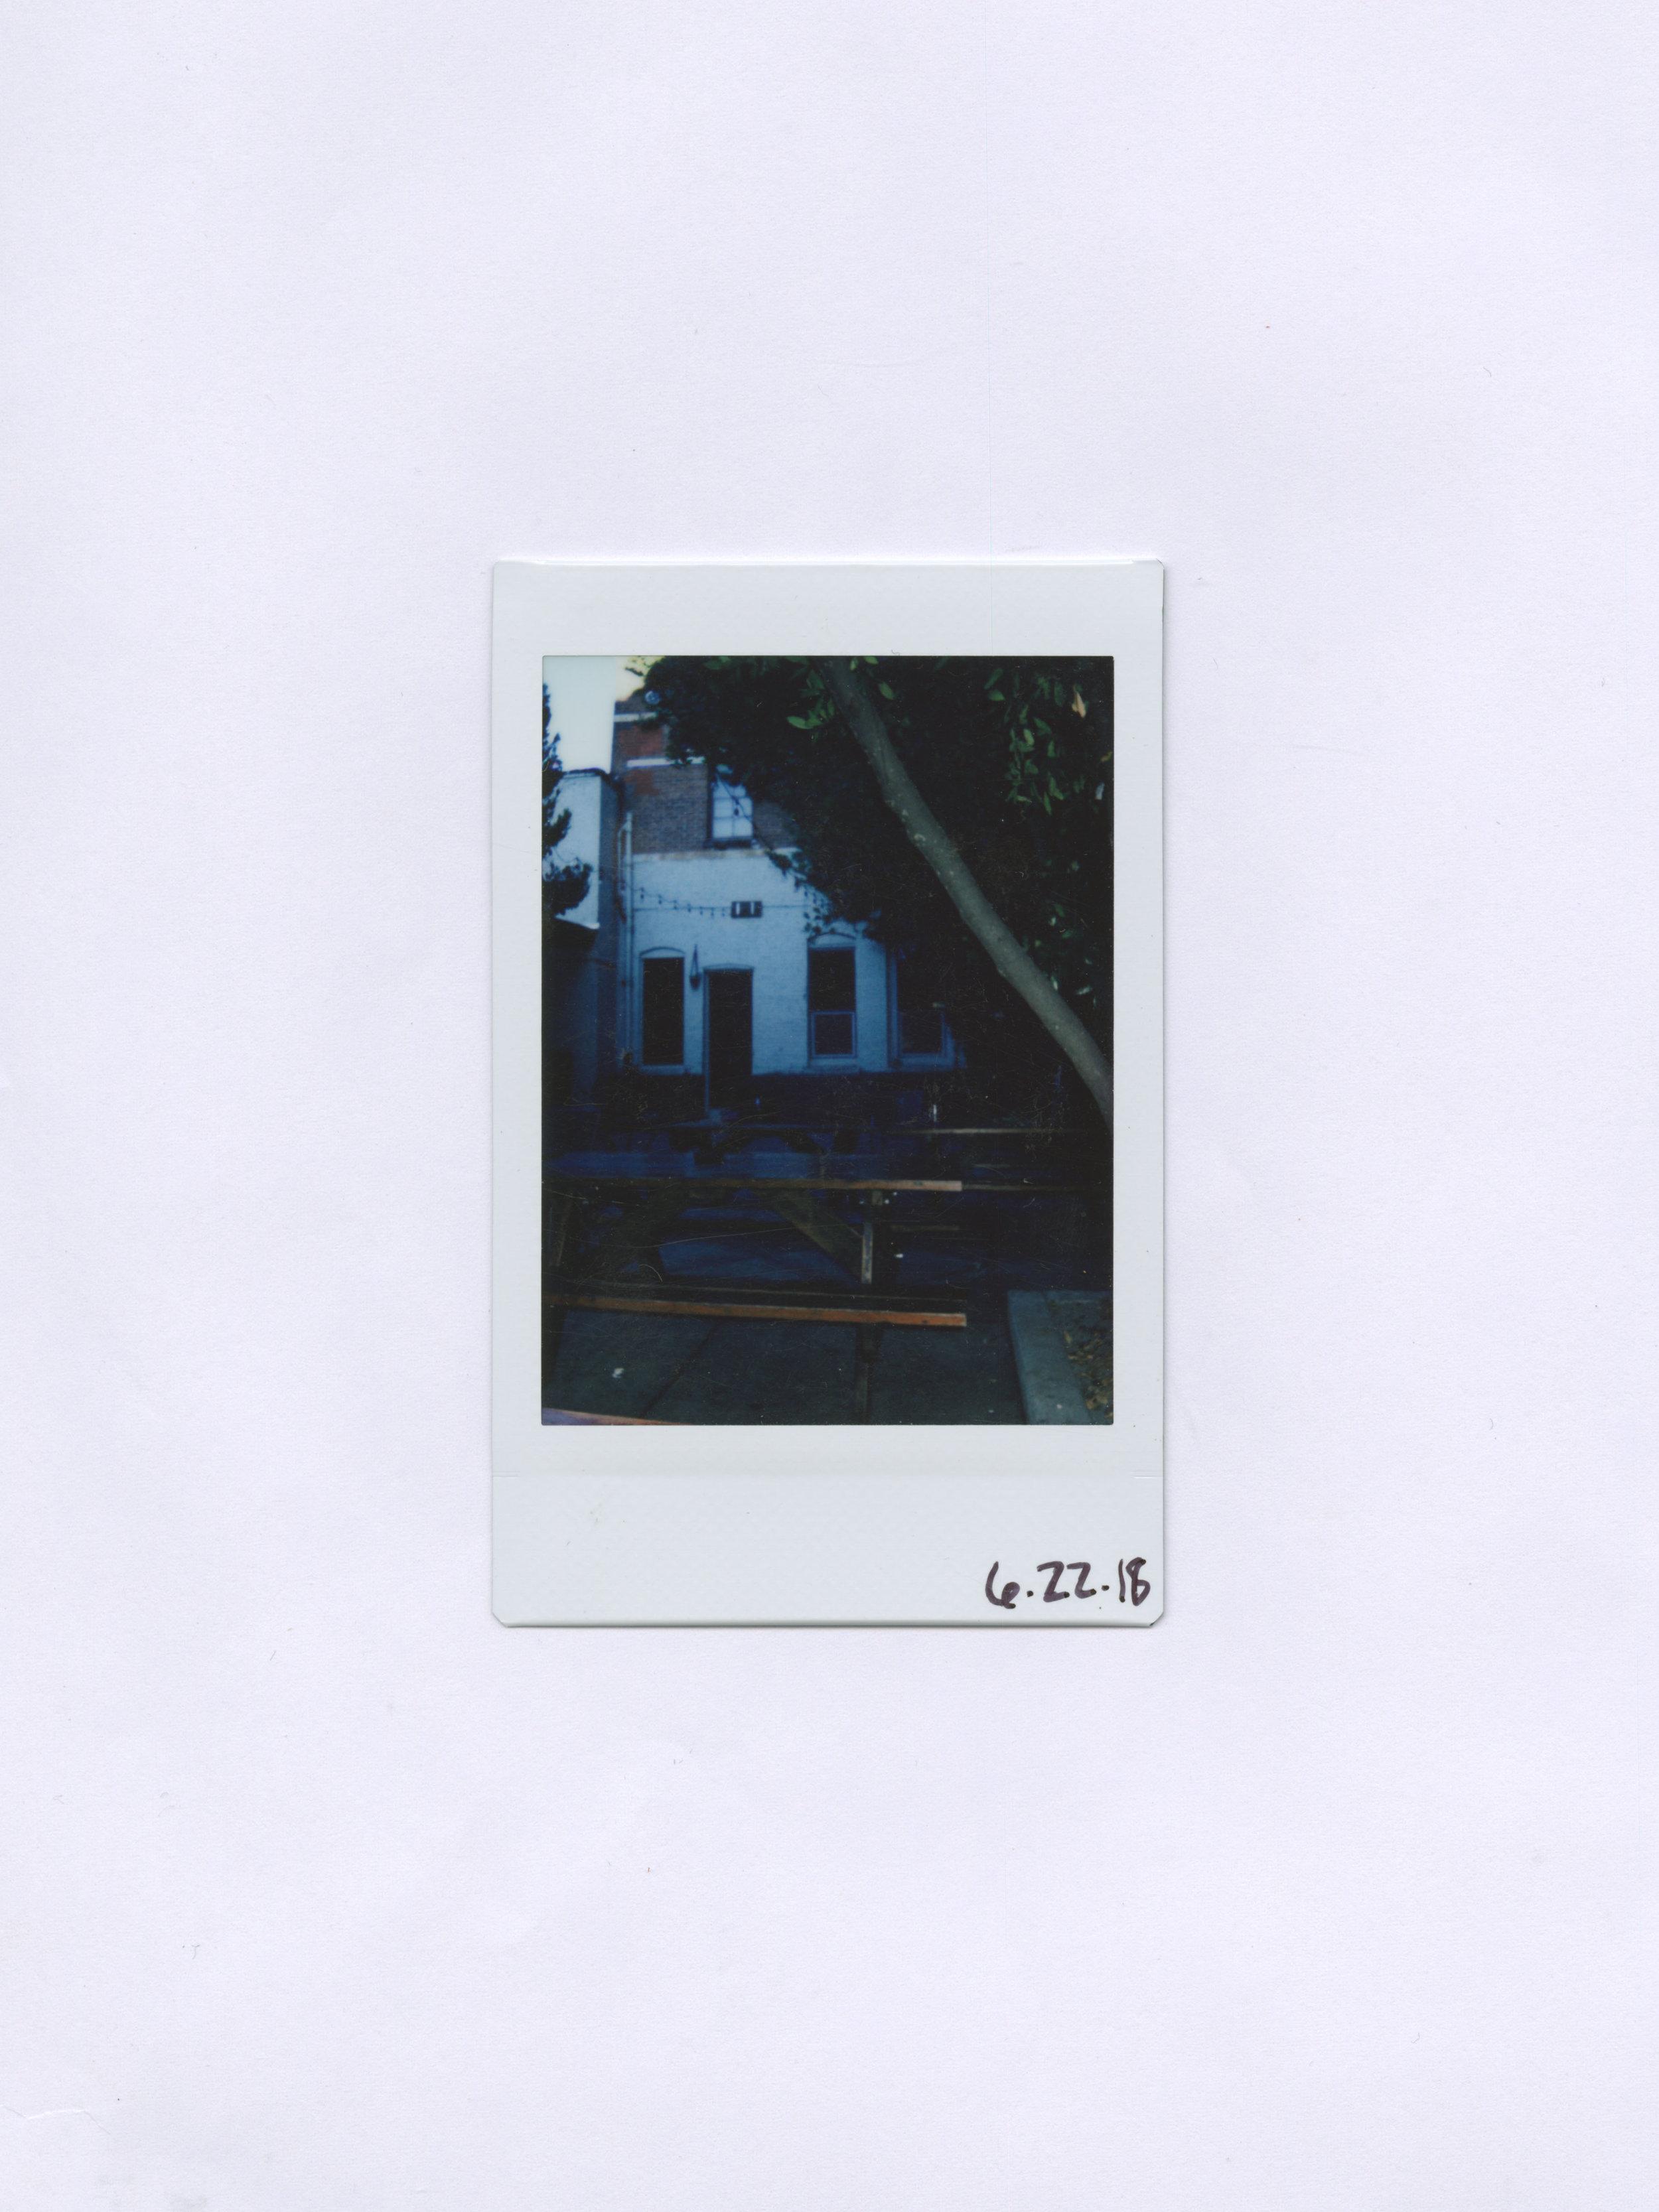 6.22.18A.jpg